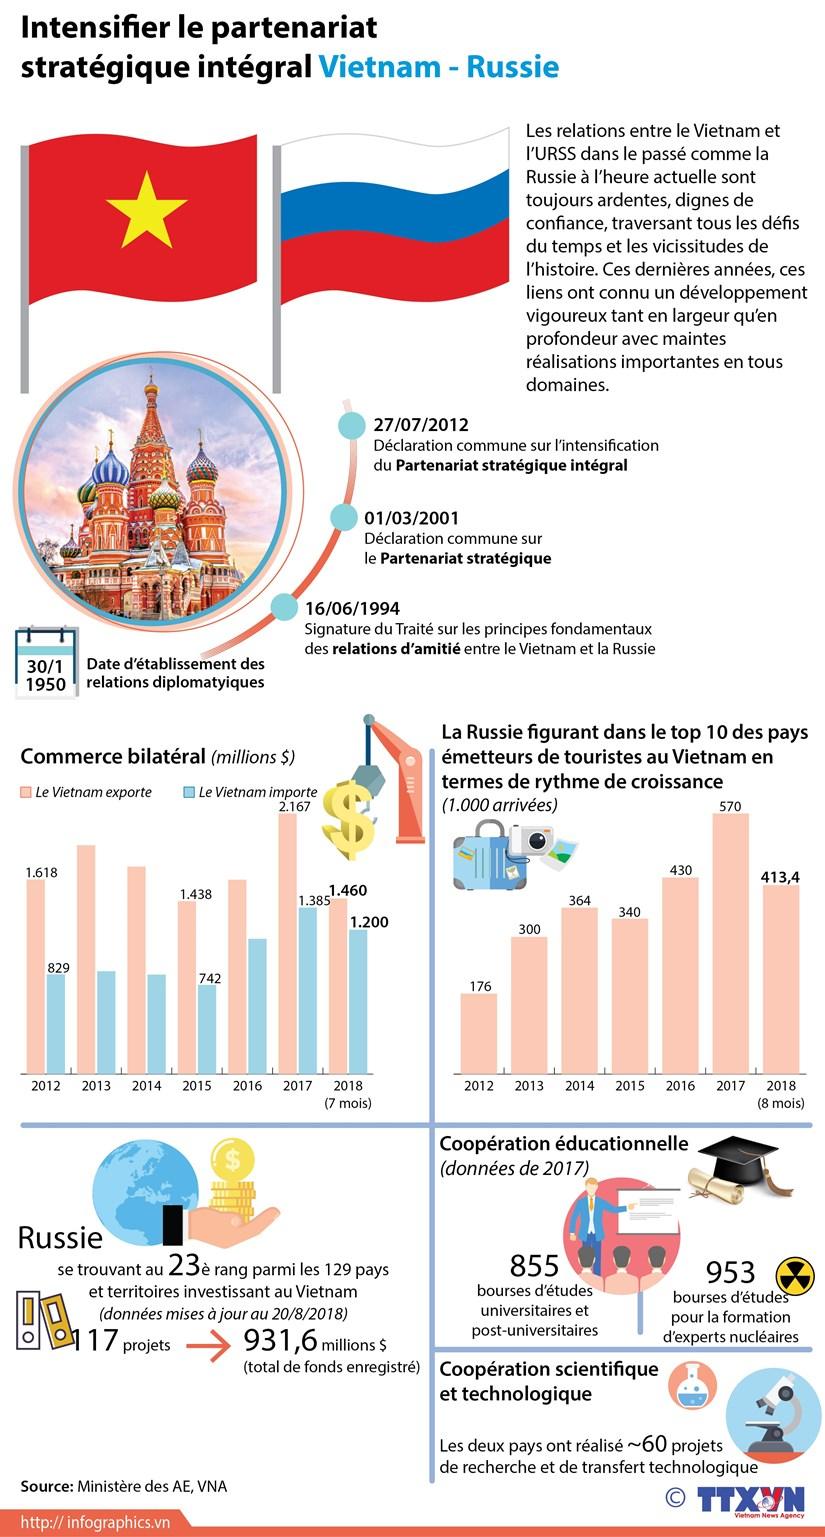 [Infographie] Intensifier le partenariat strategique integral Vietnam - Russie hinh anh 1